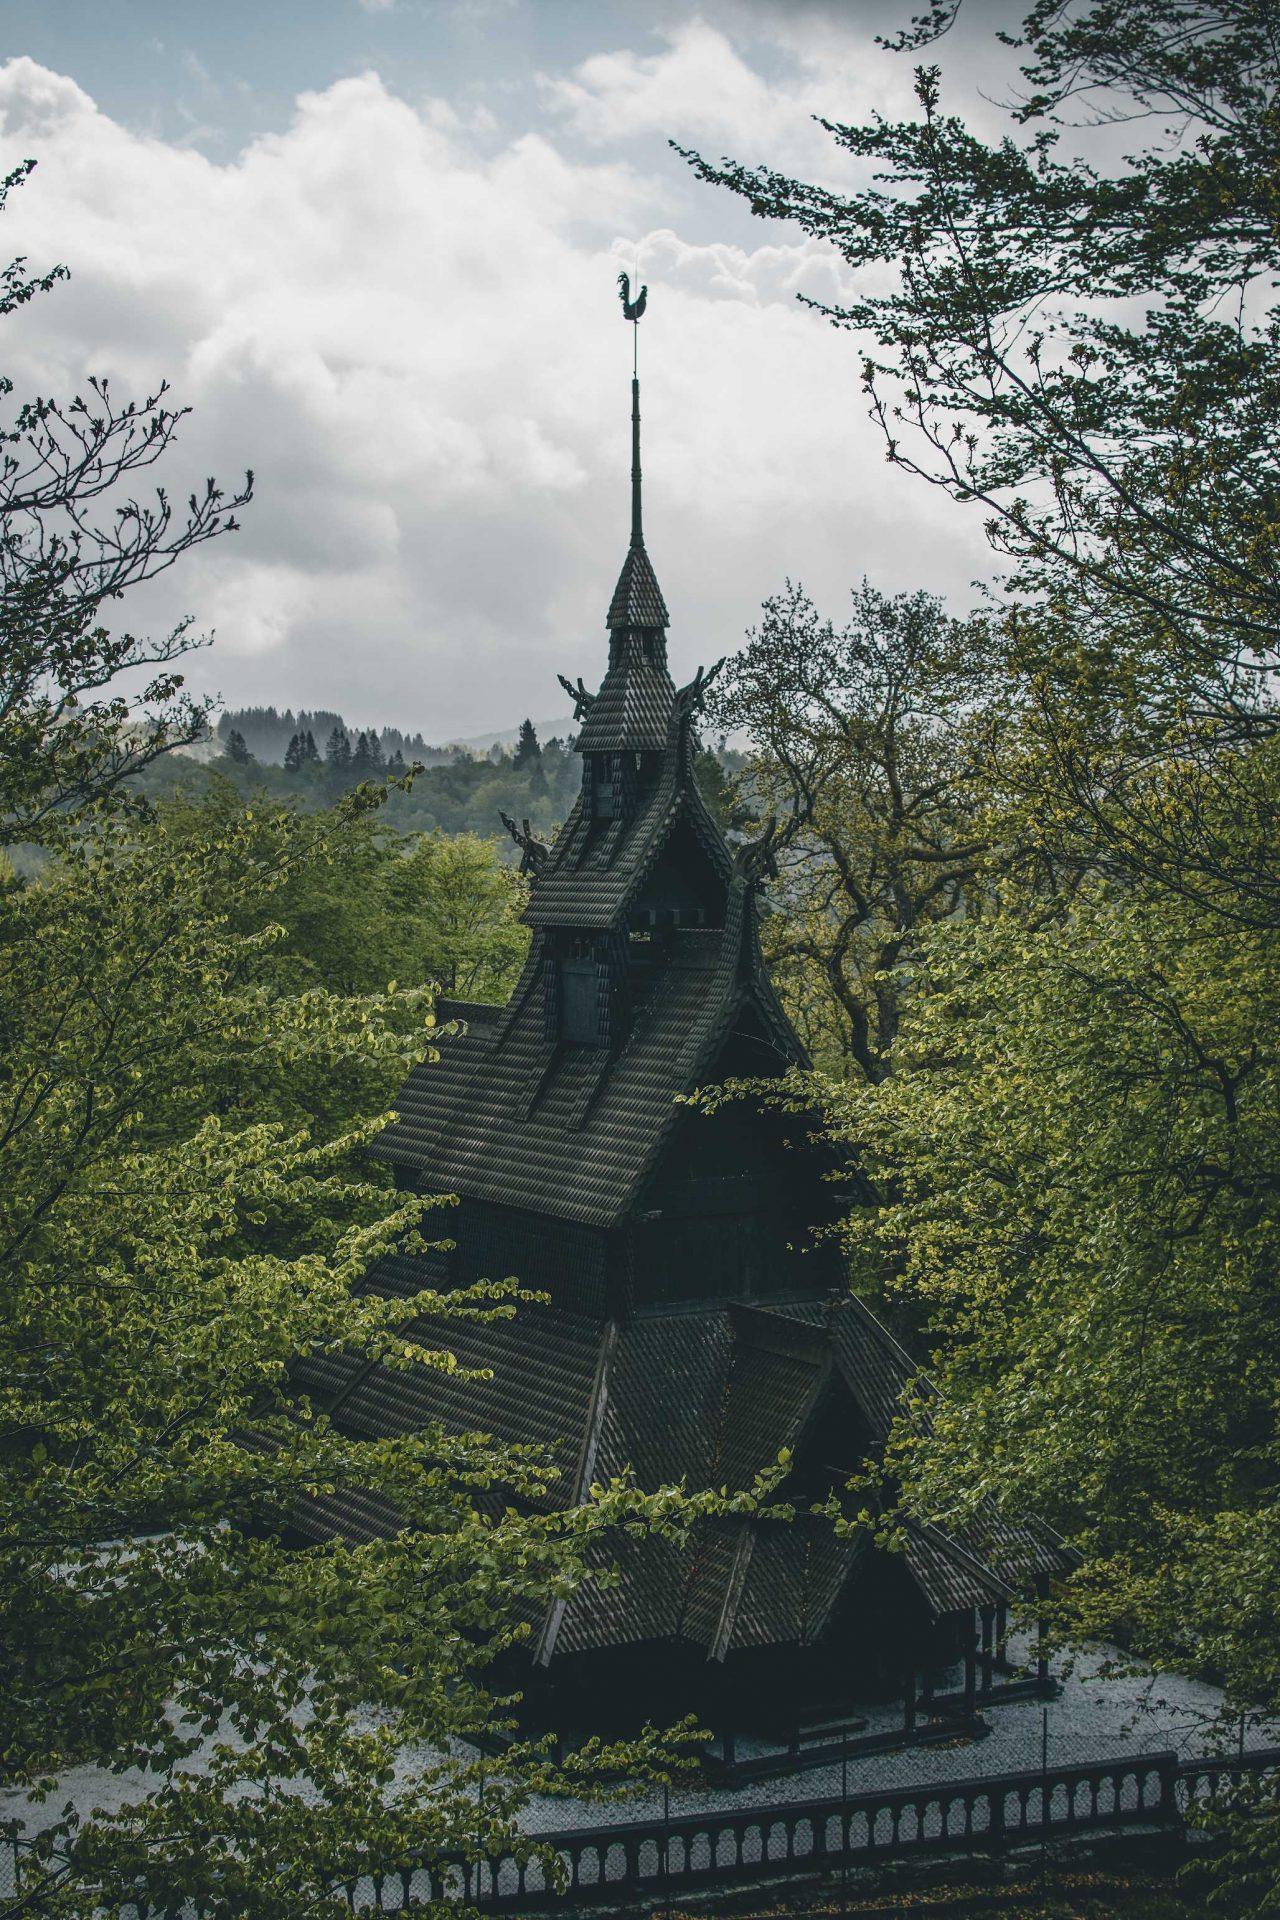 kościół wBergen